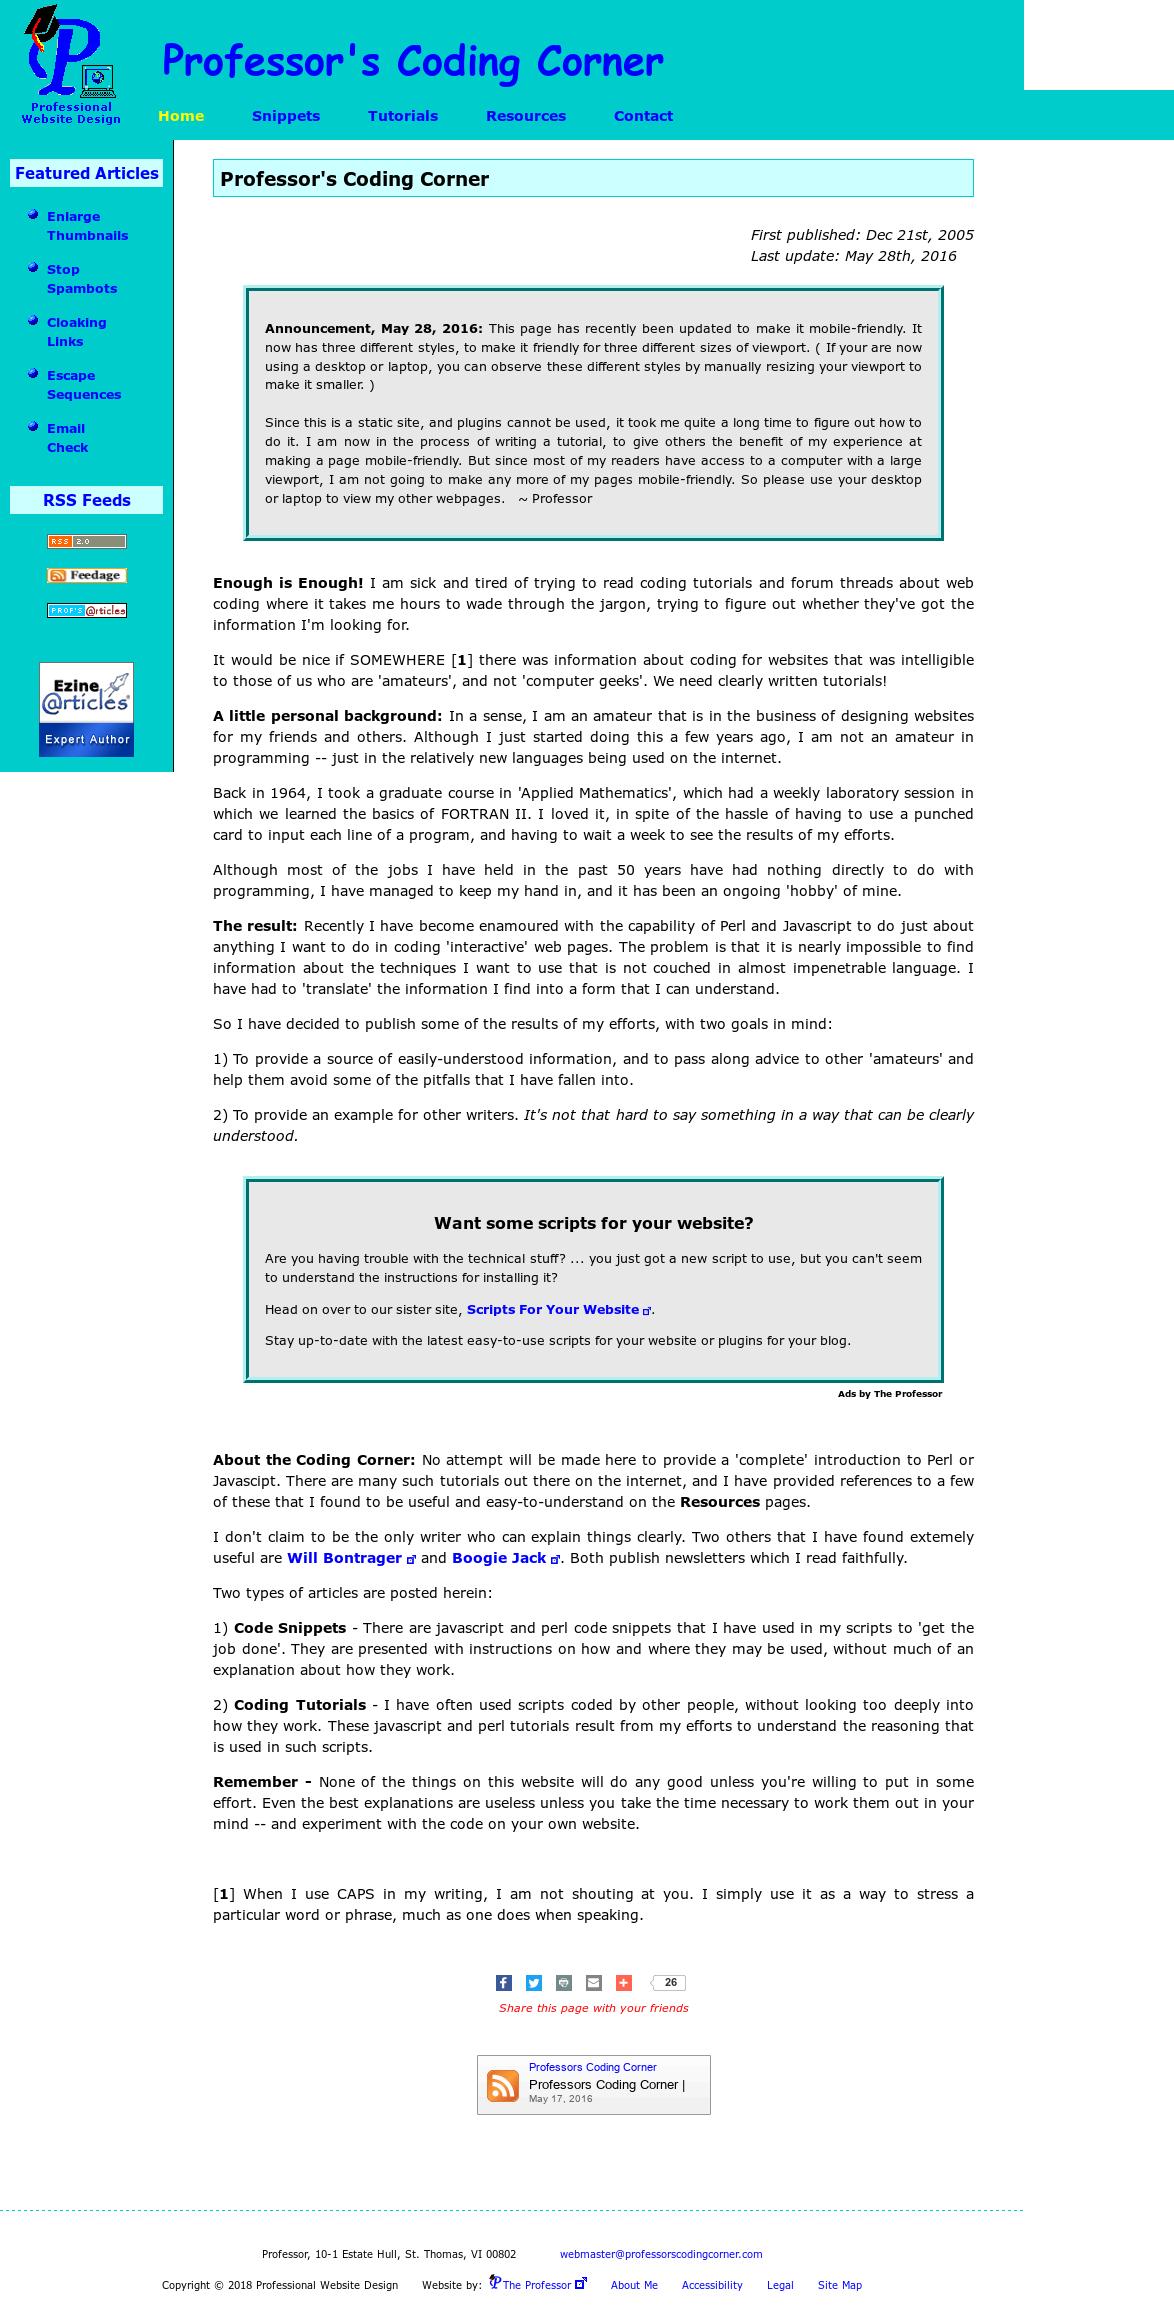 Professorscodingcorner Competitors, Revenue and Employees